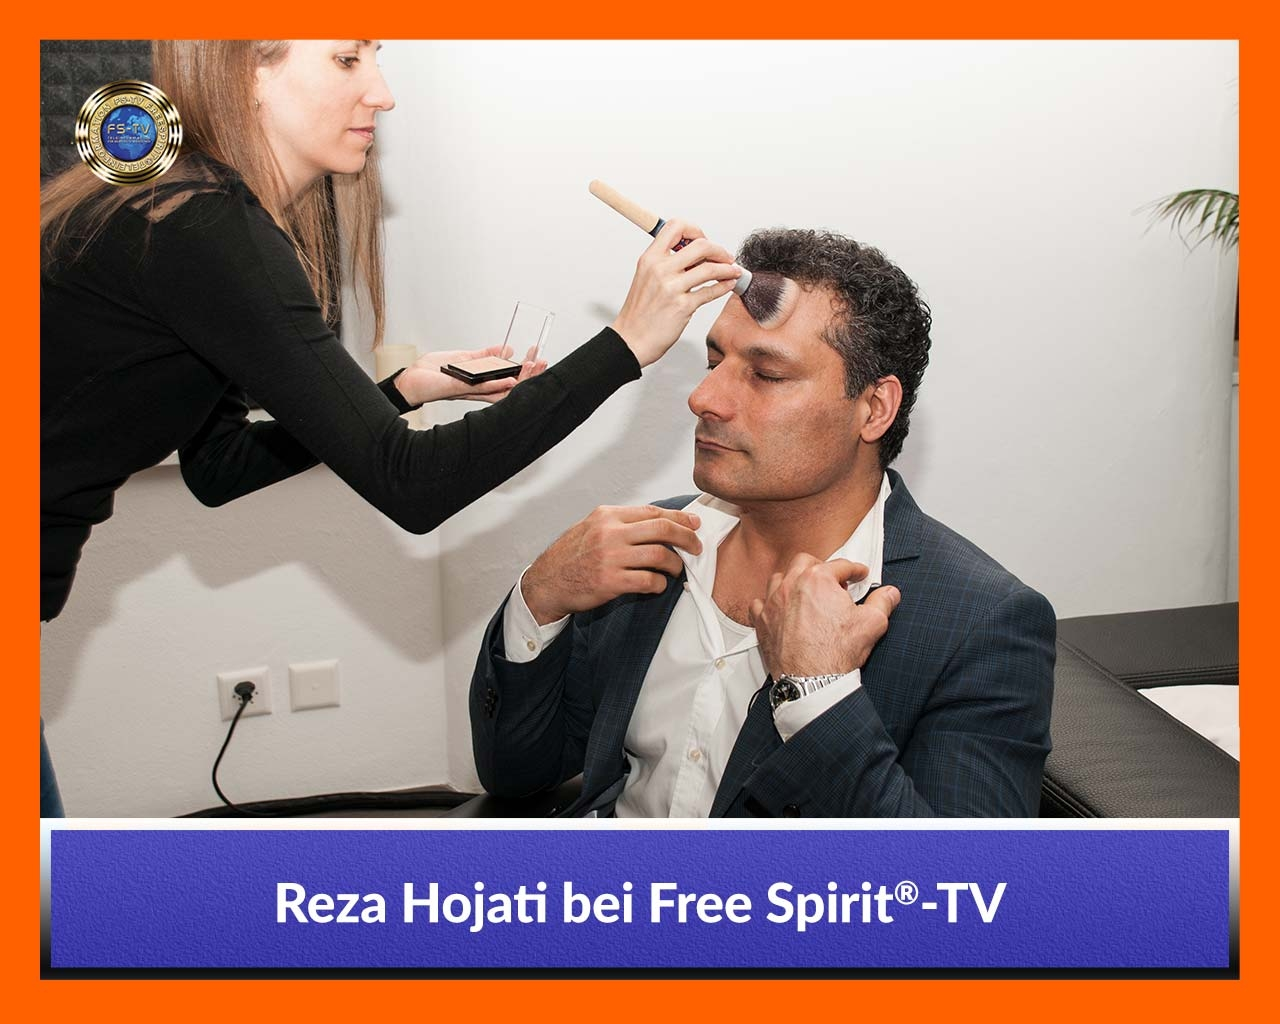 Reza-Hojati-14